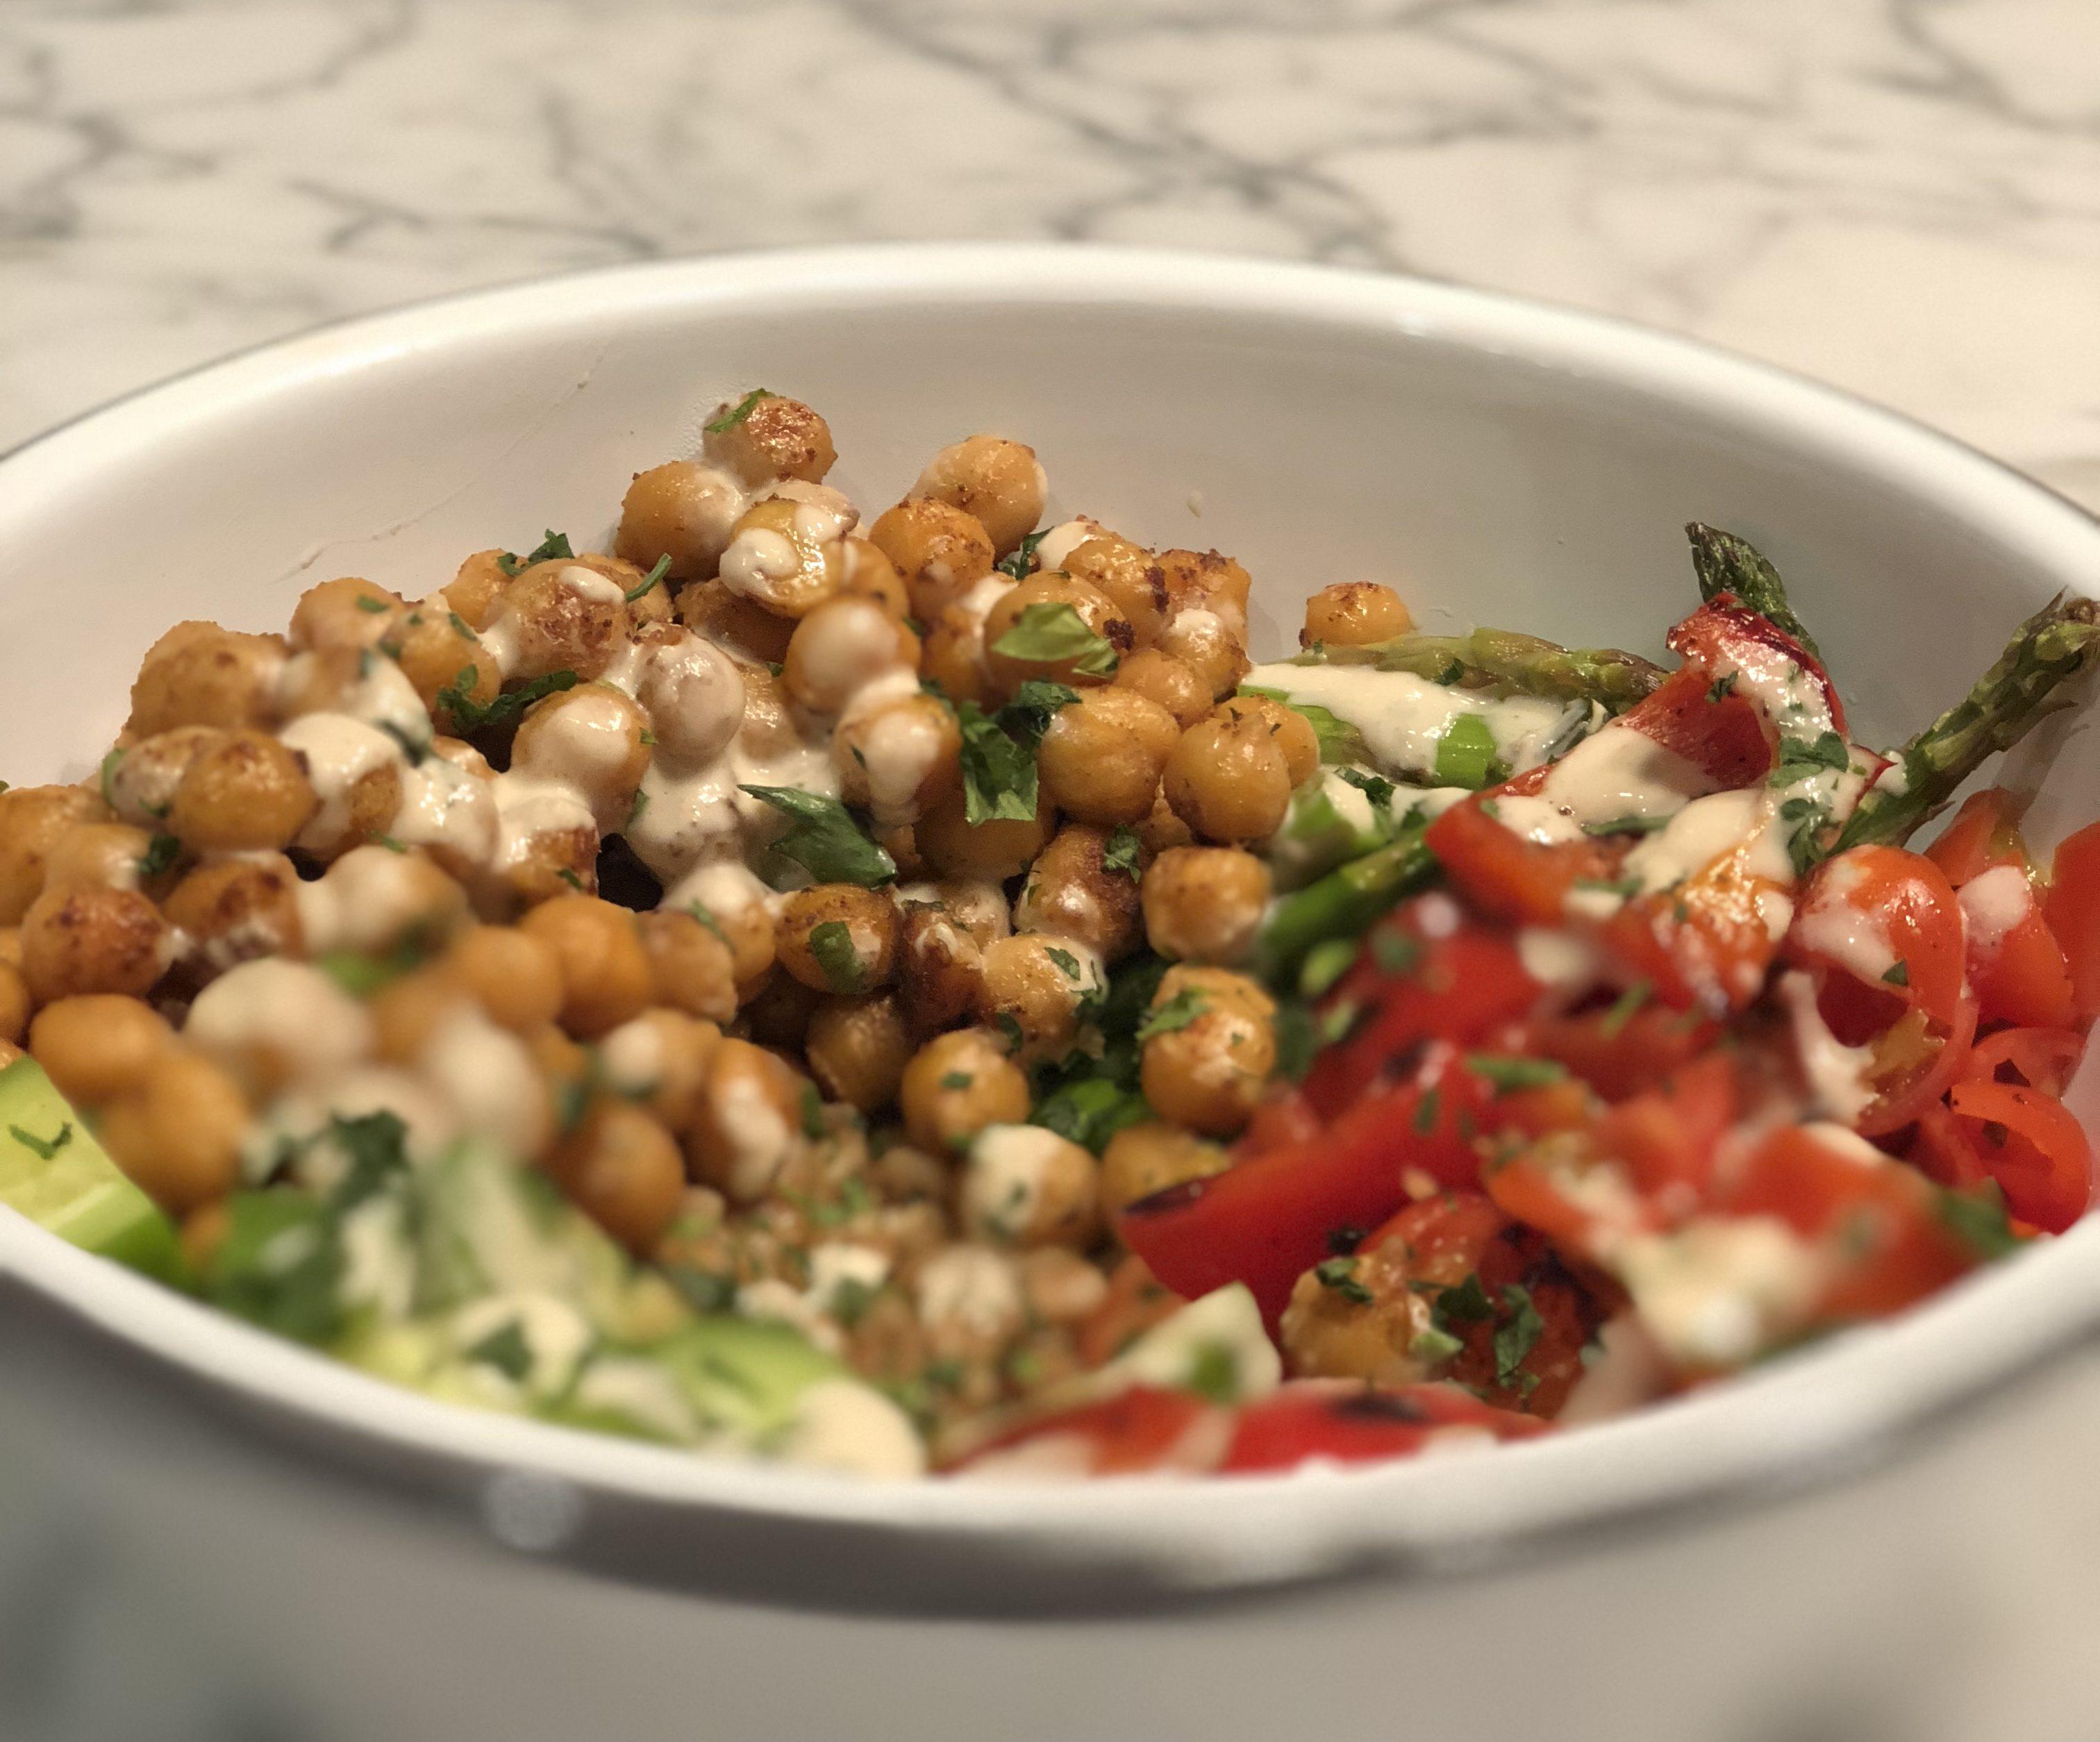 Roasted Chickpea and Farro Salad